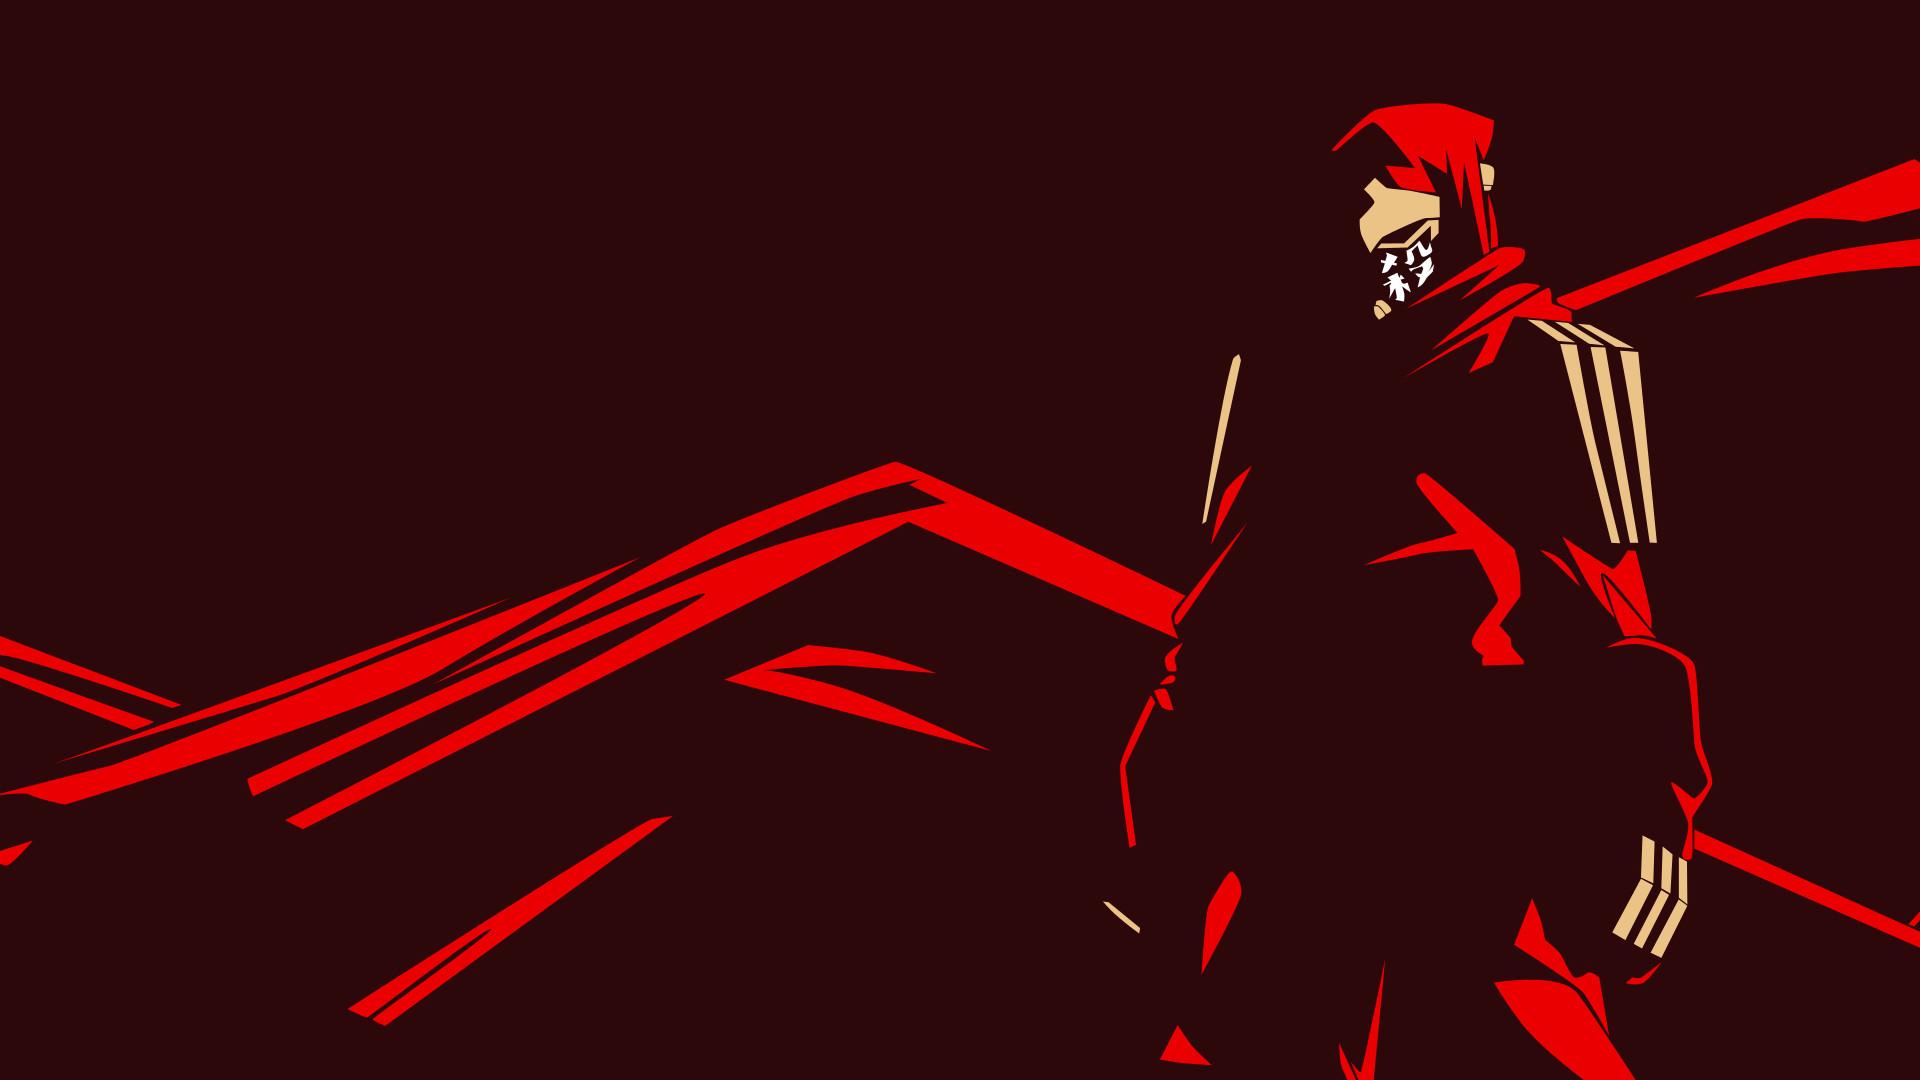 Res: 1920x1080, Ninja Slayer Vector Wallpaper by herrerarausaure on DeviantArt